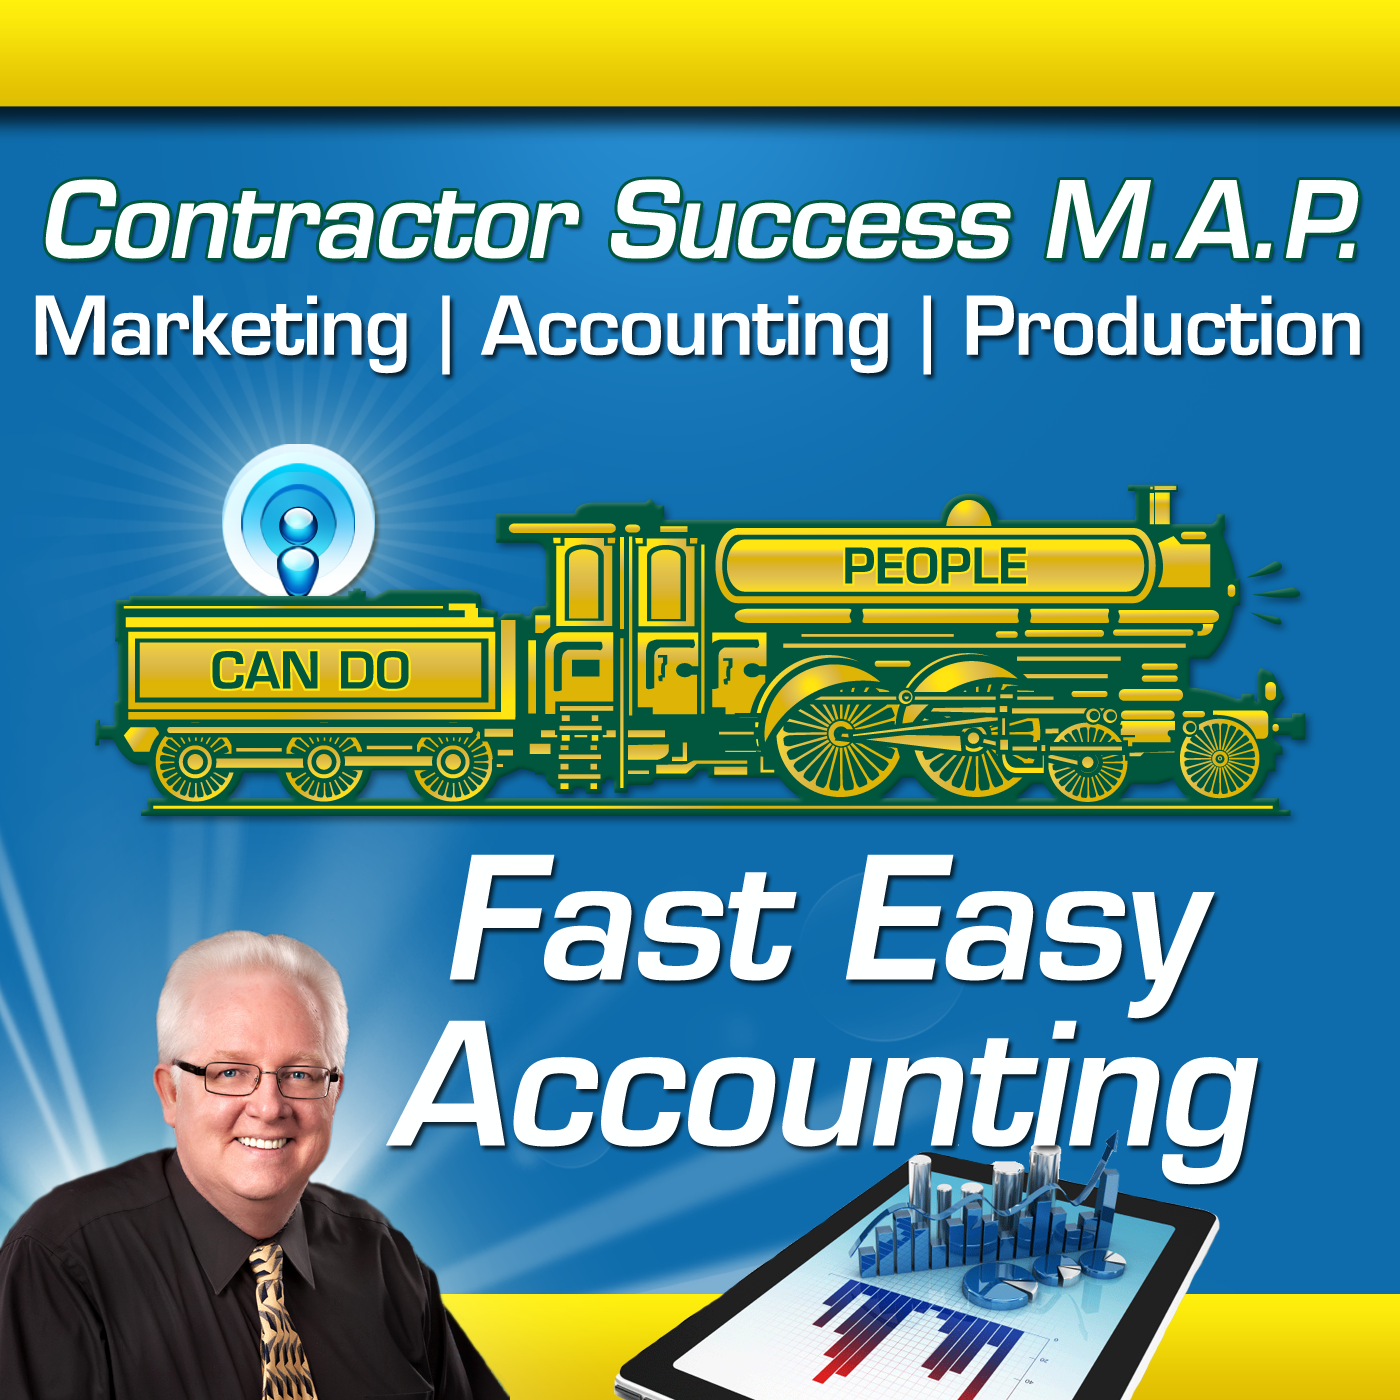 Fast-Easy-Accounting-Contractors-Success-Map-Album-Art-1